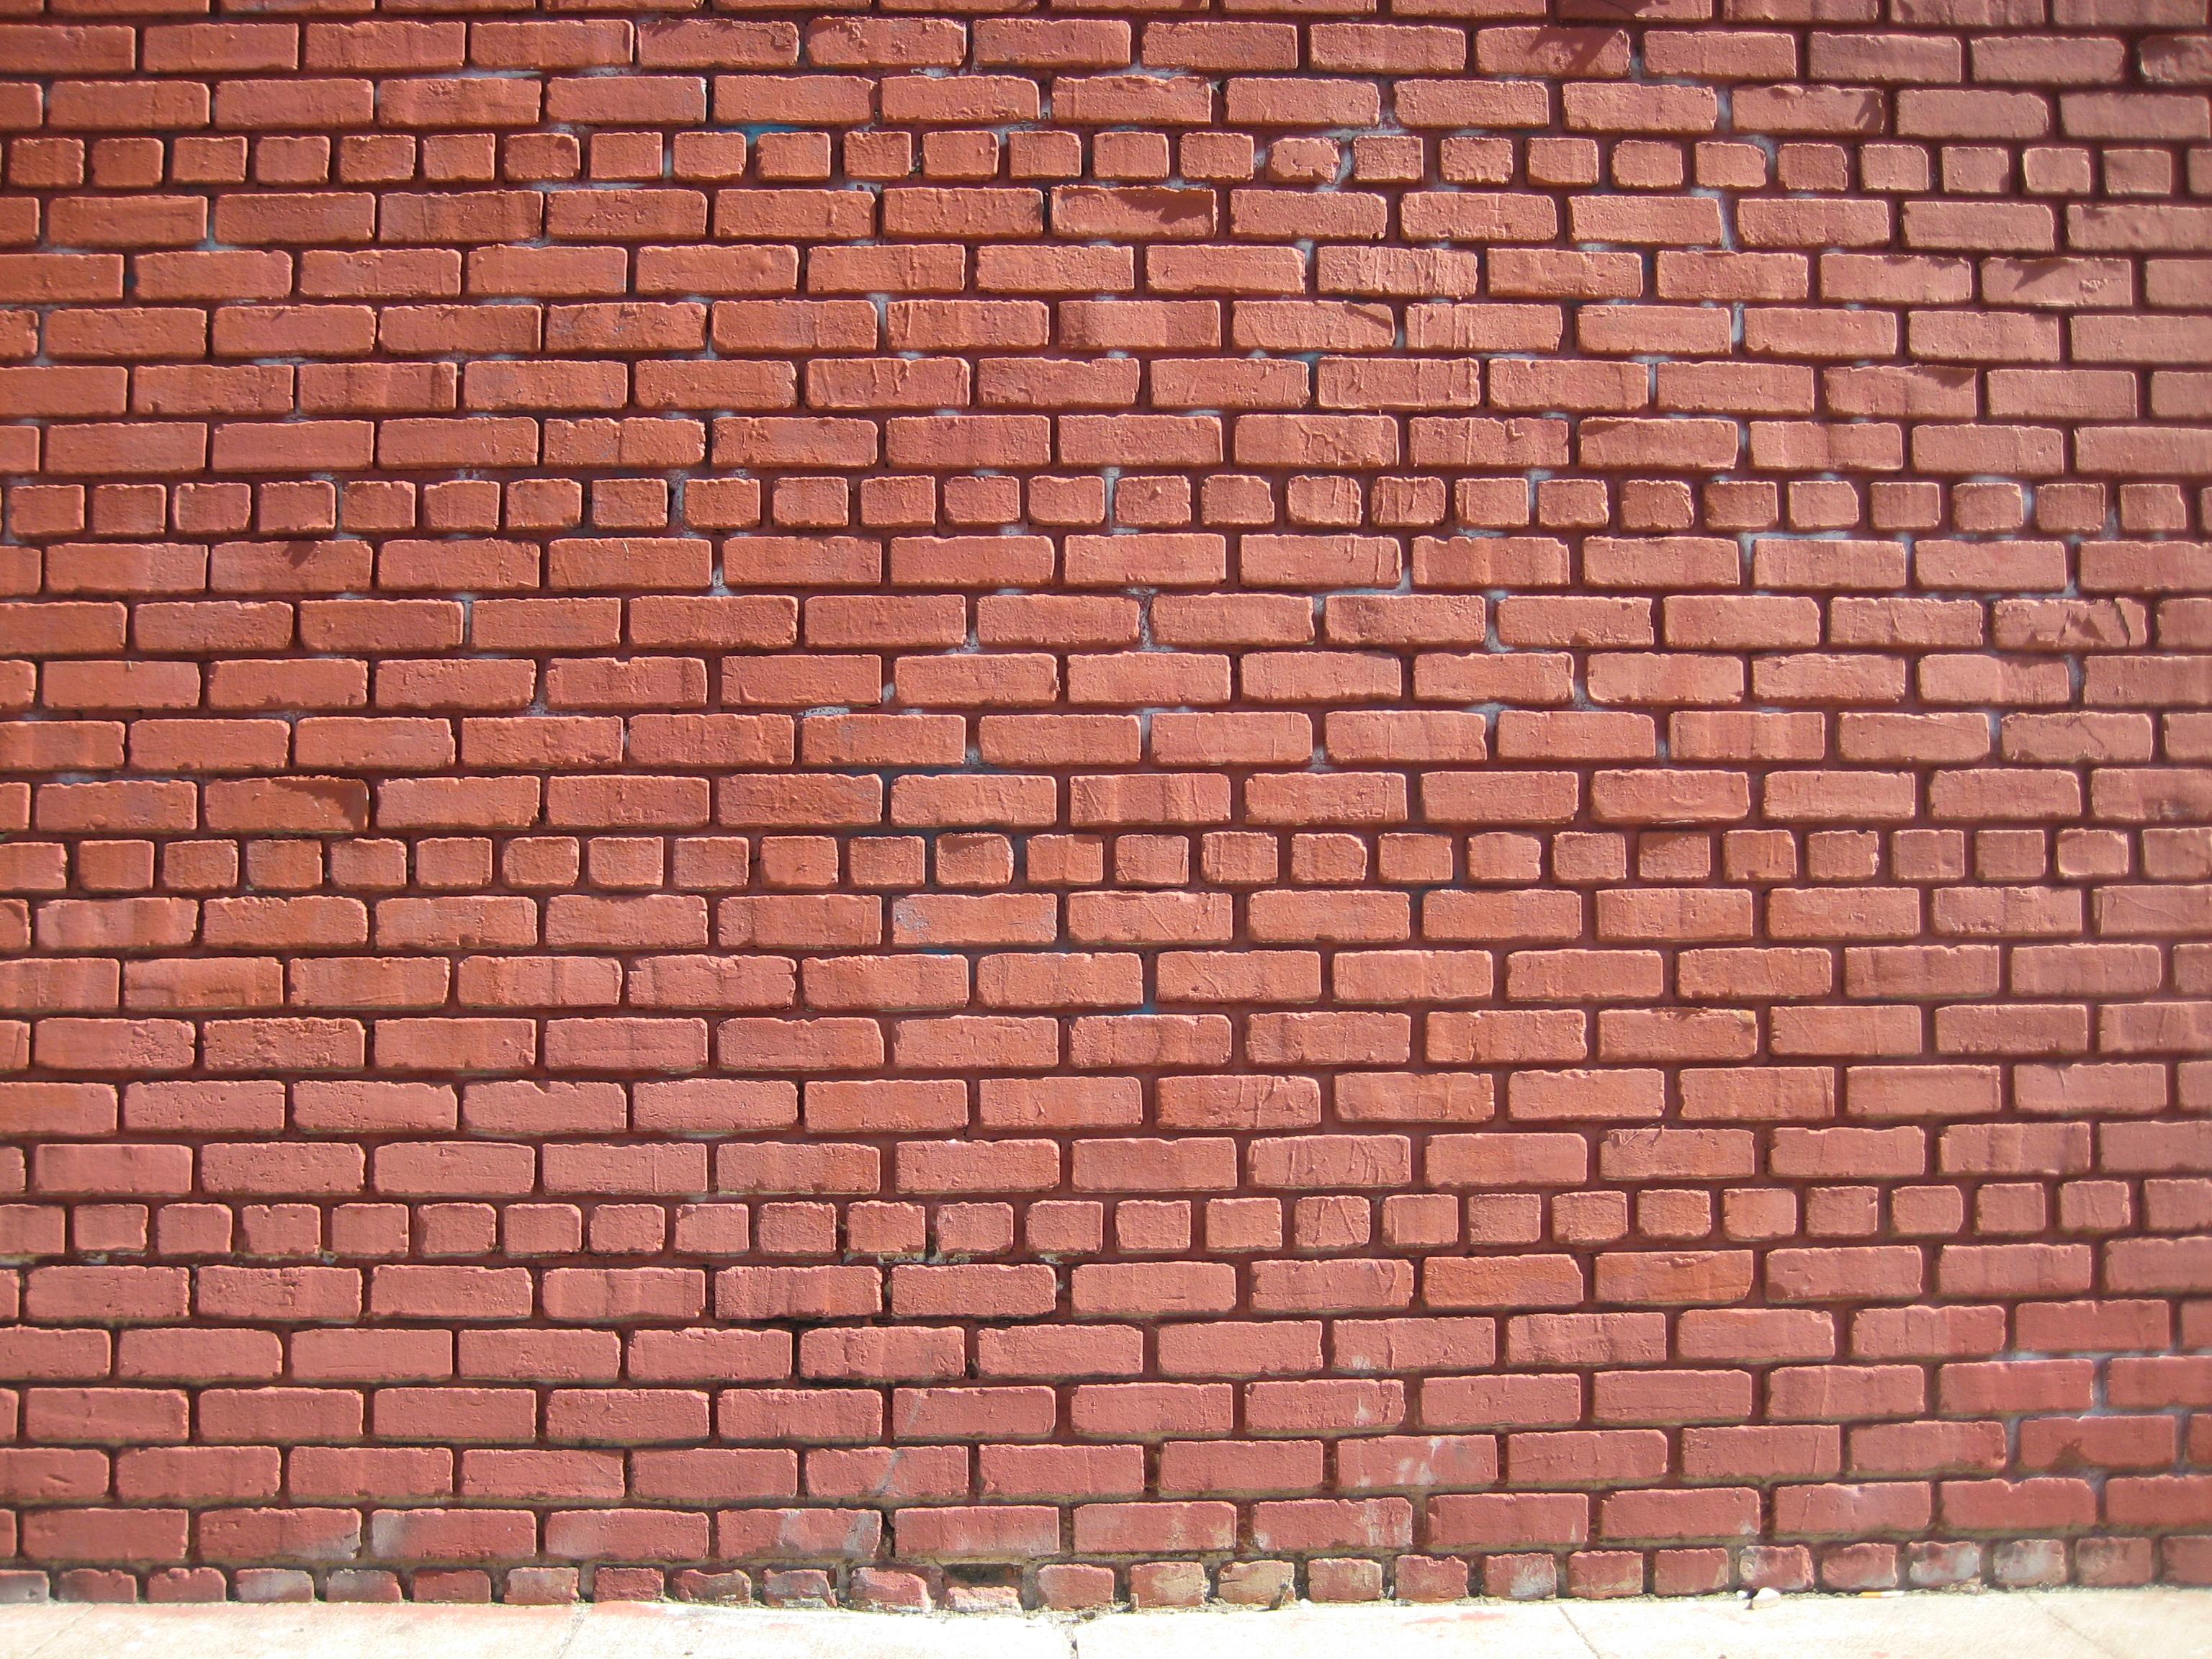 Red Brick Texture by Michael Macro on DeviantArt